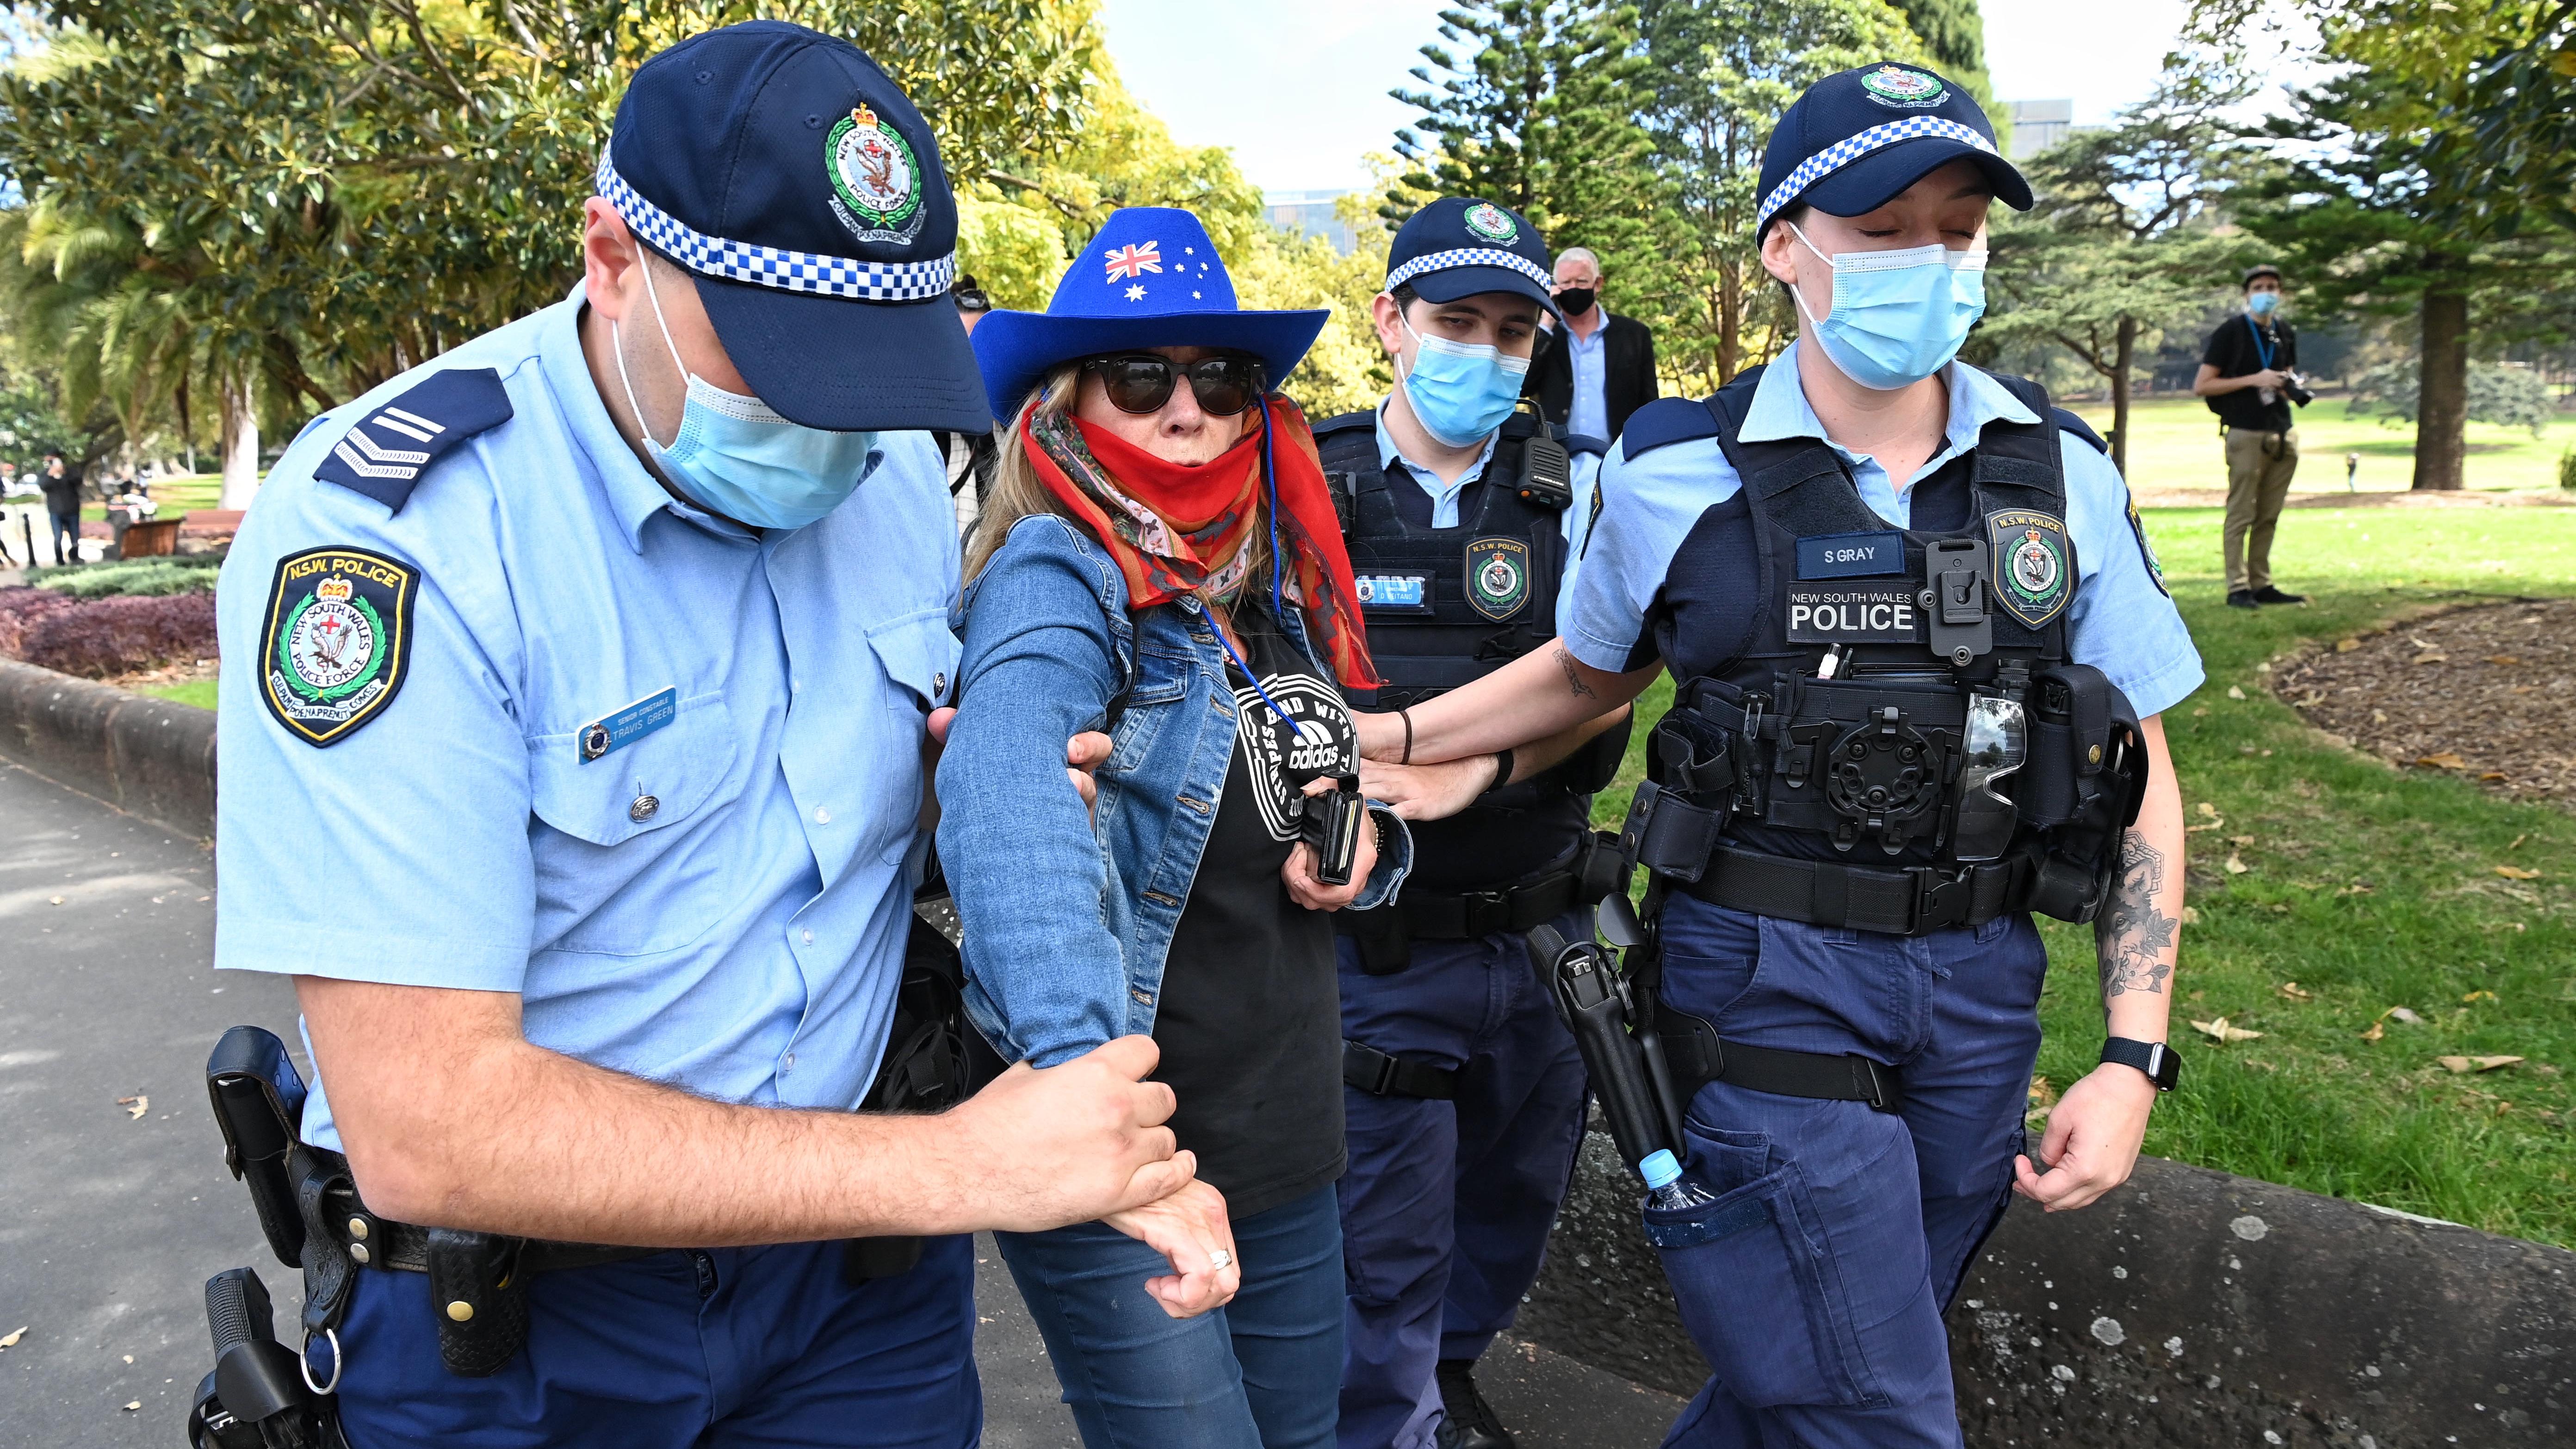 Police arrest Anti lockdown protesters at Victoria Park, Sydney.